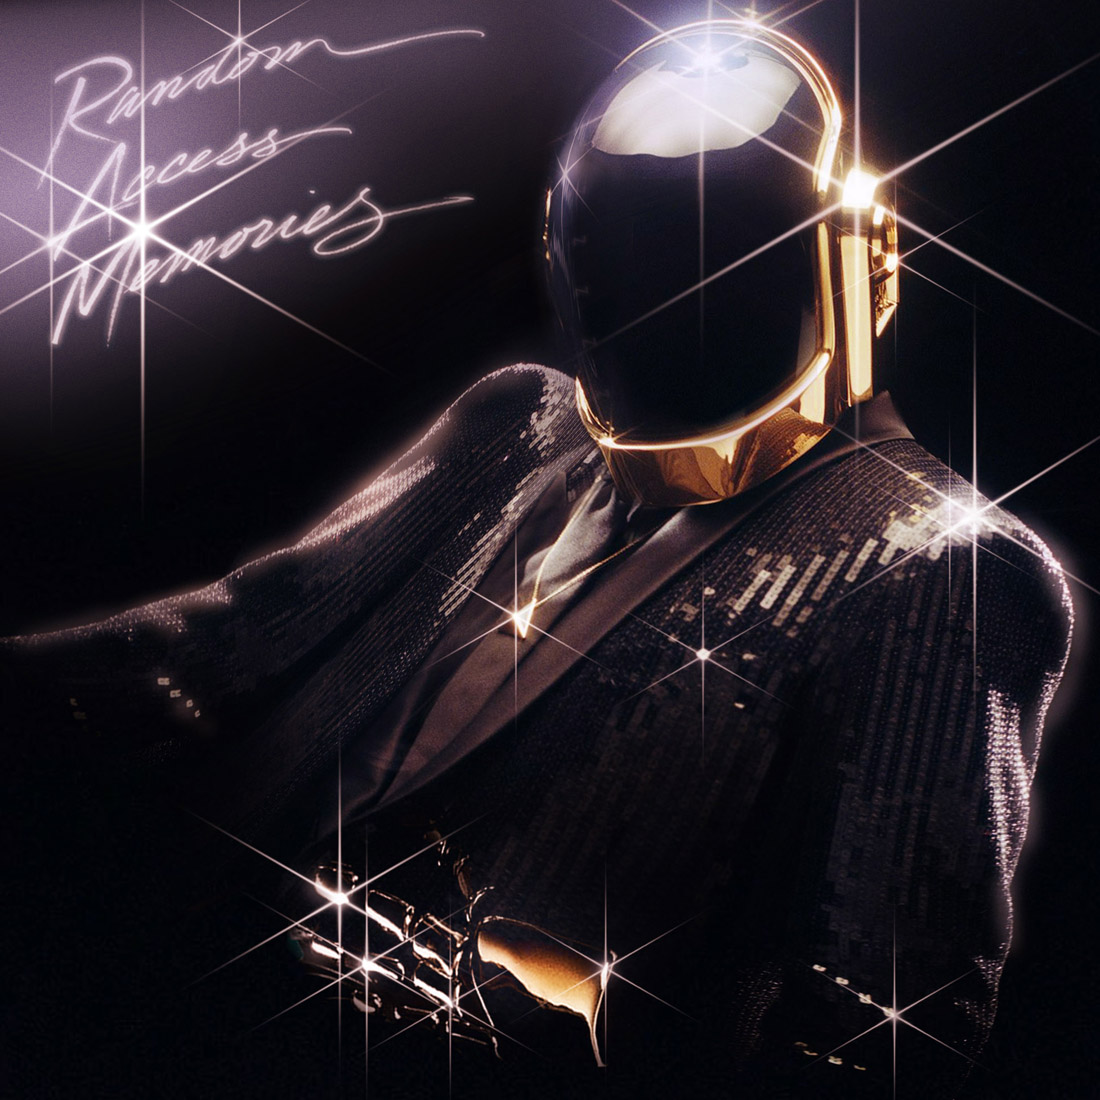 Random Access Memories - Daft Punk Photo (34260121) - Fanpop